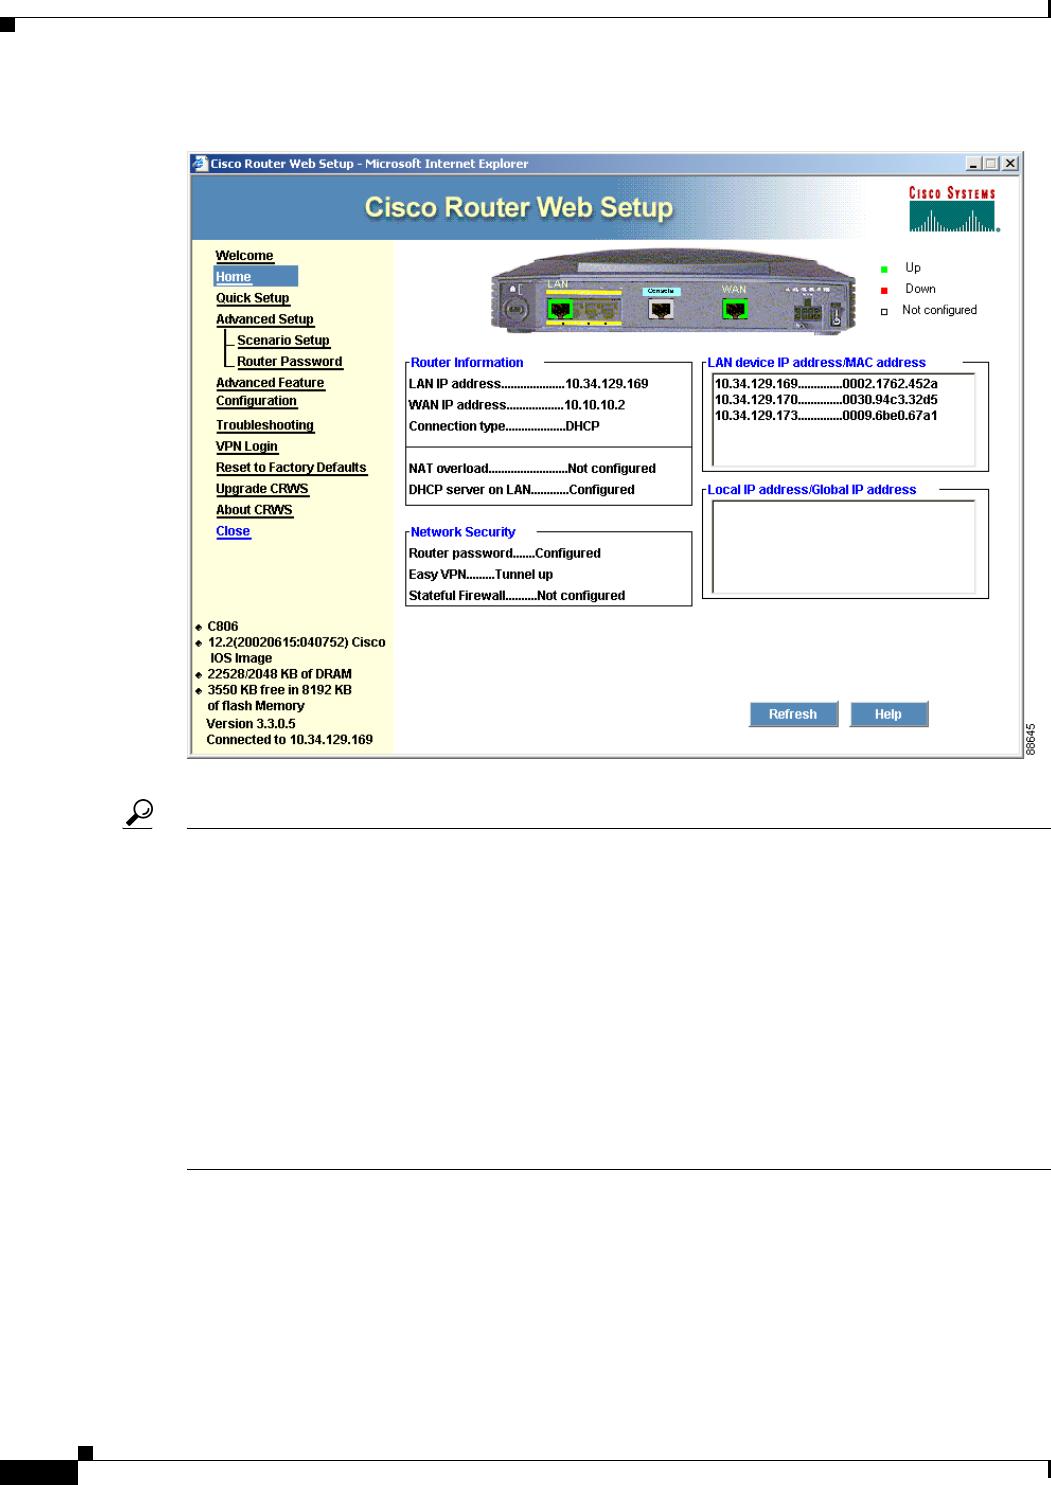 Handleiding Cisco SOHO 97 (pagina 2 van 8) (English)